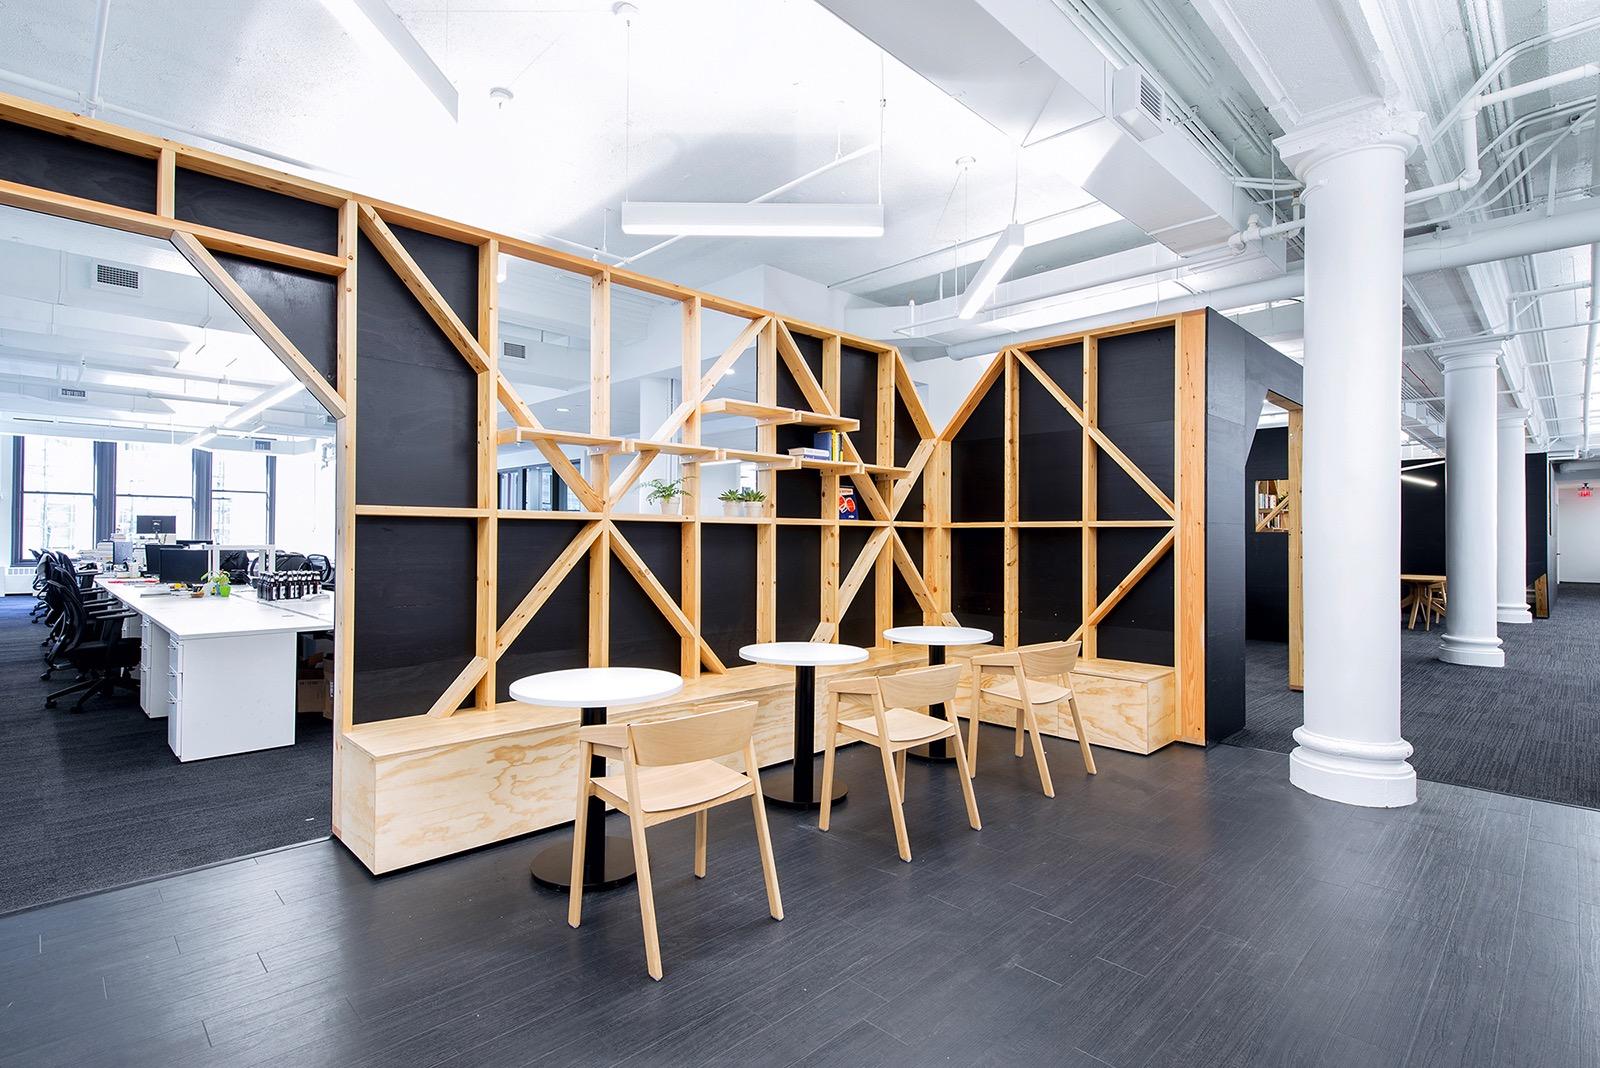 qz-office-nyc-8